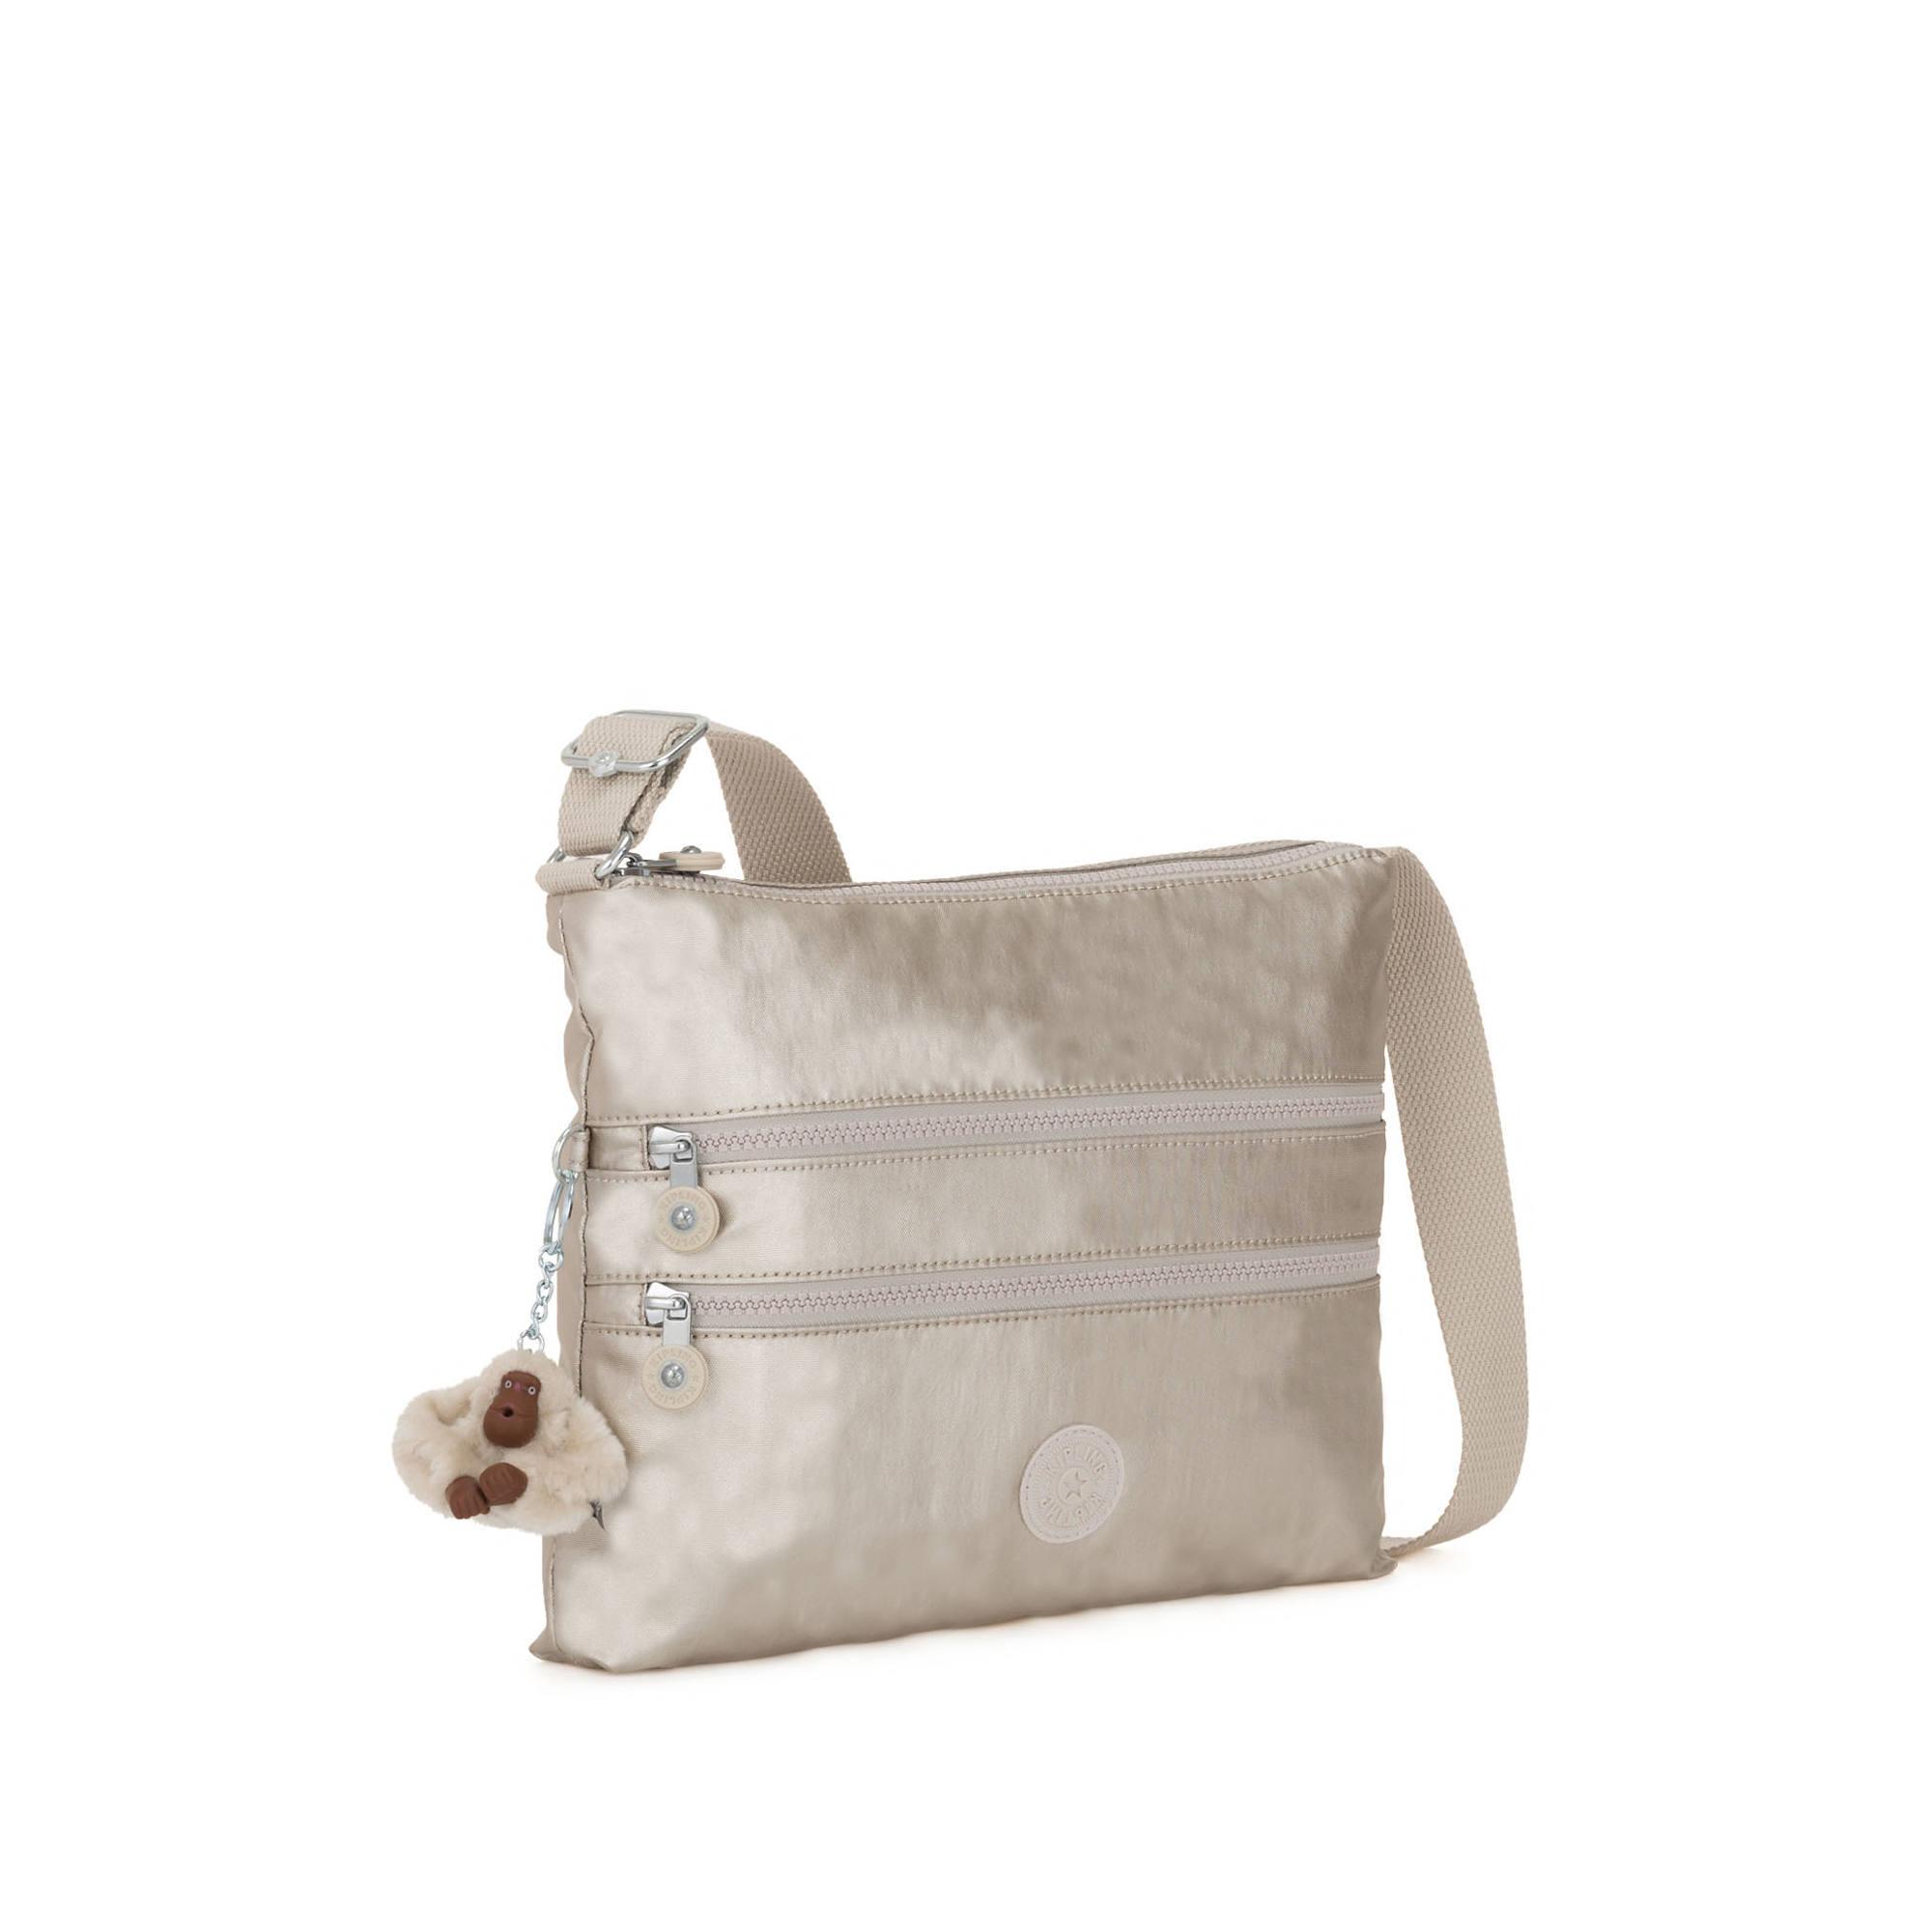 Kipling-Alvar-Metallic-Crossbody-Bag miniature 15